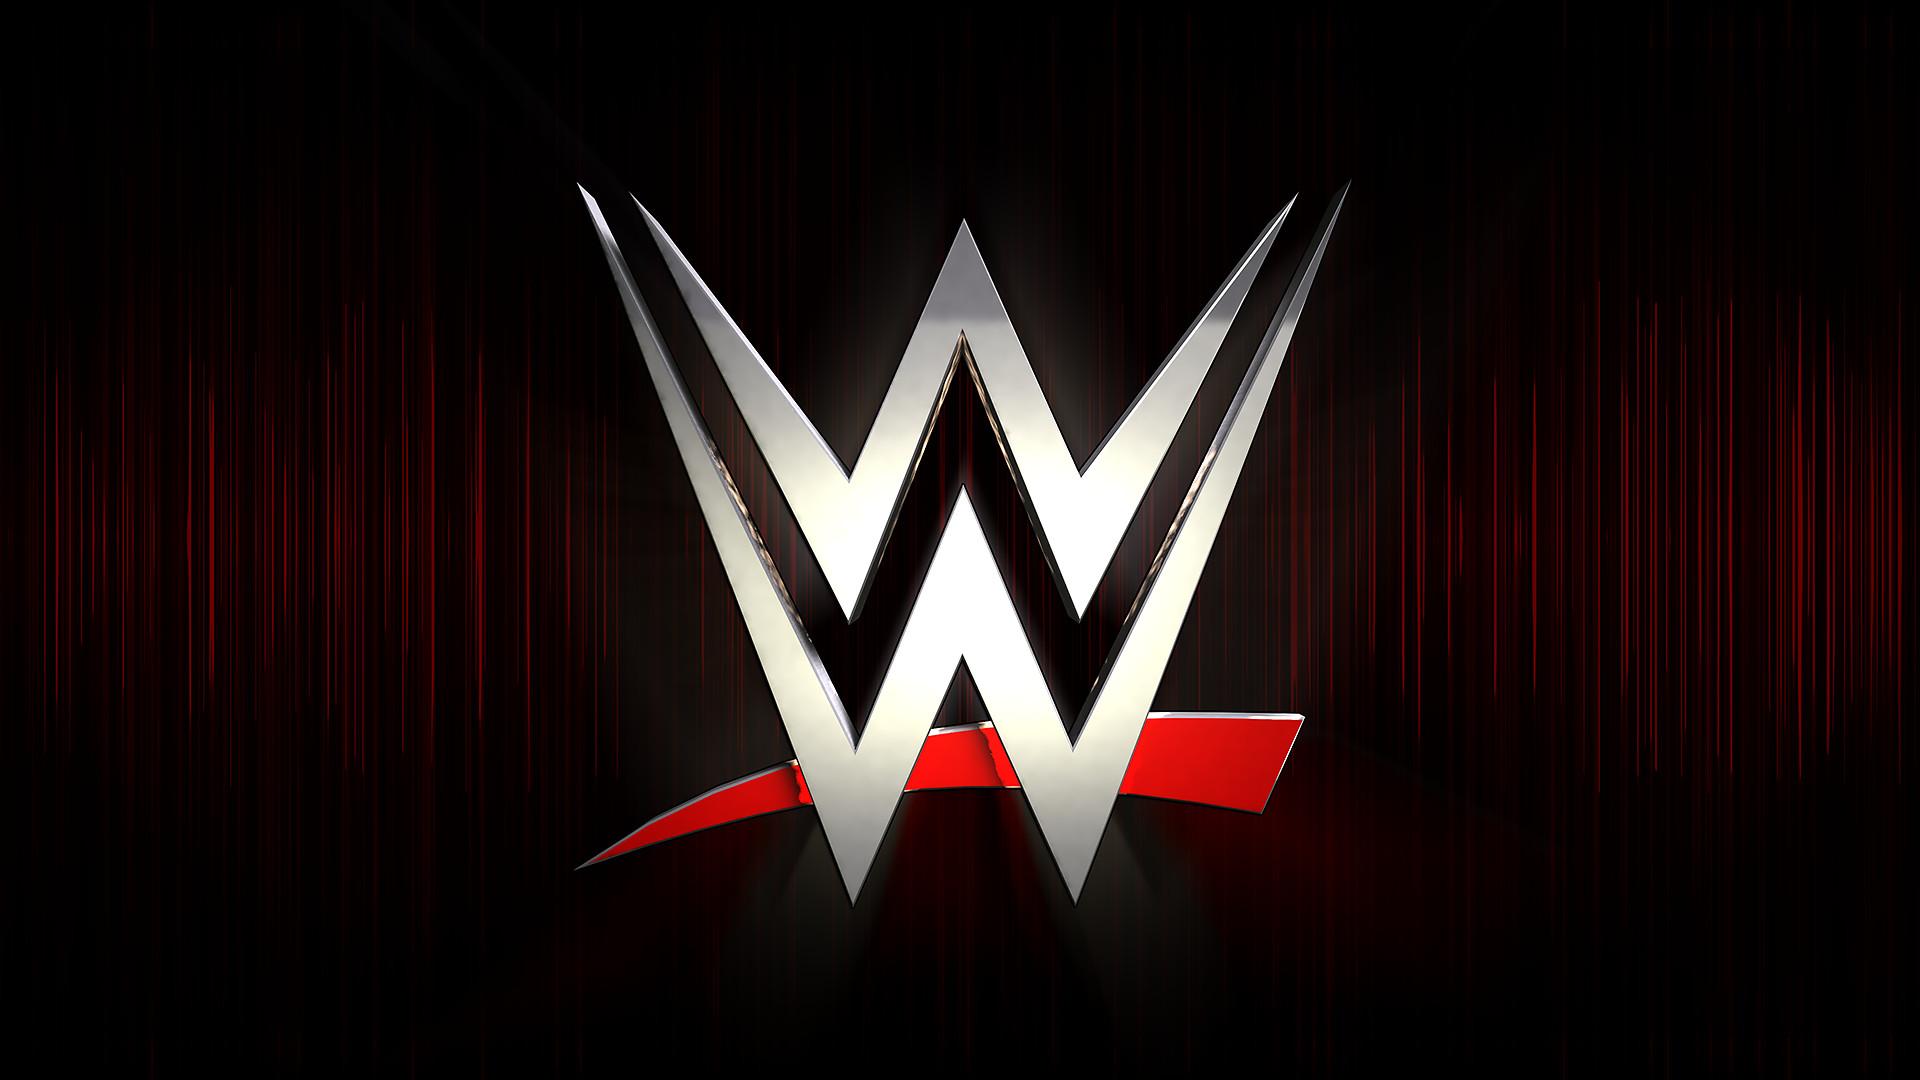 WWE HD Wallpapers Wallpaper | HD Wallpapers | Pinterest | Hd wallpaper,  Wallpaper and Wallpaper free download